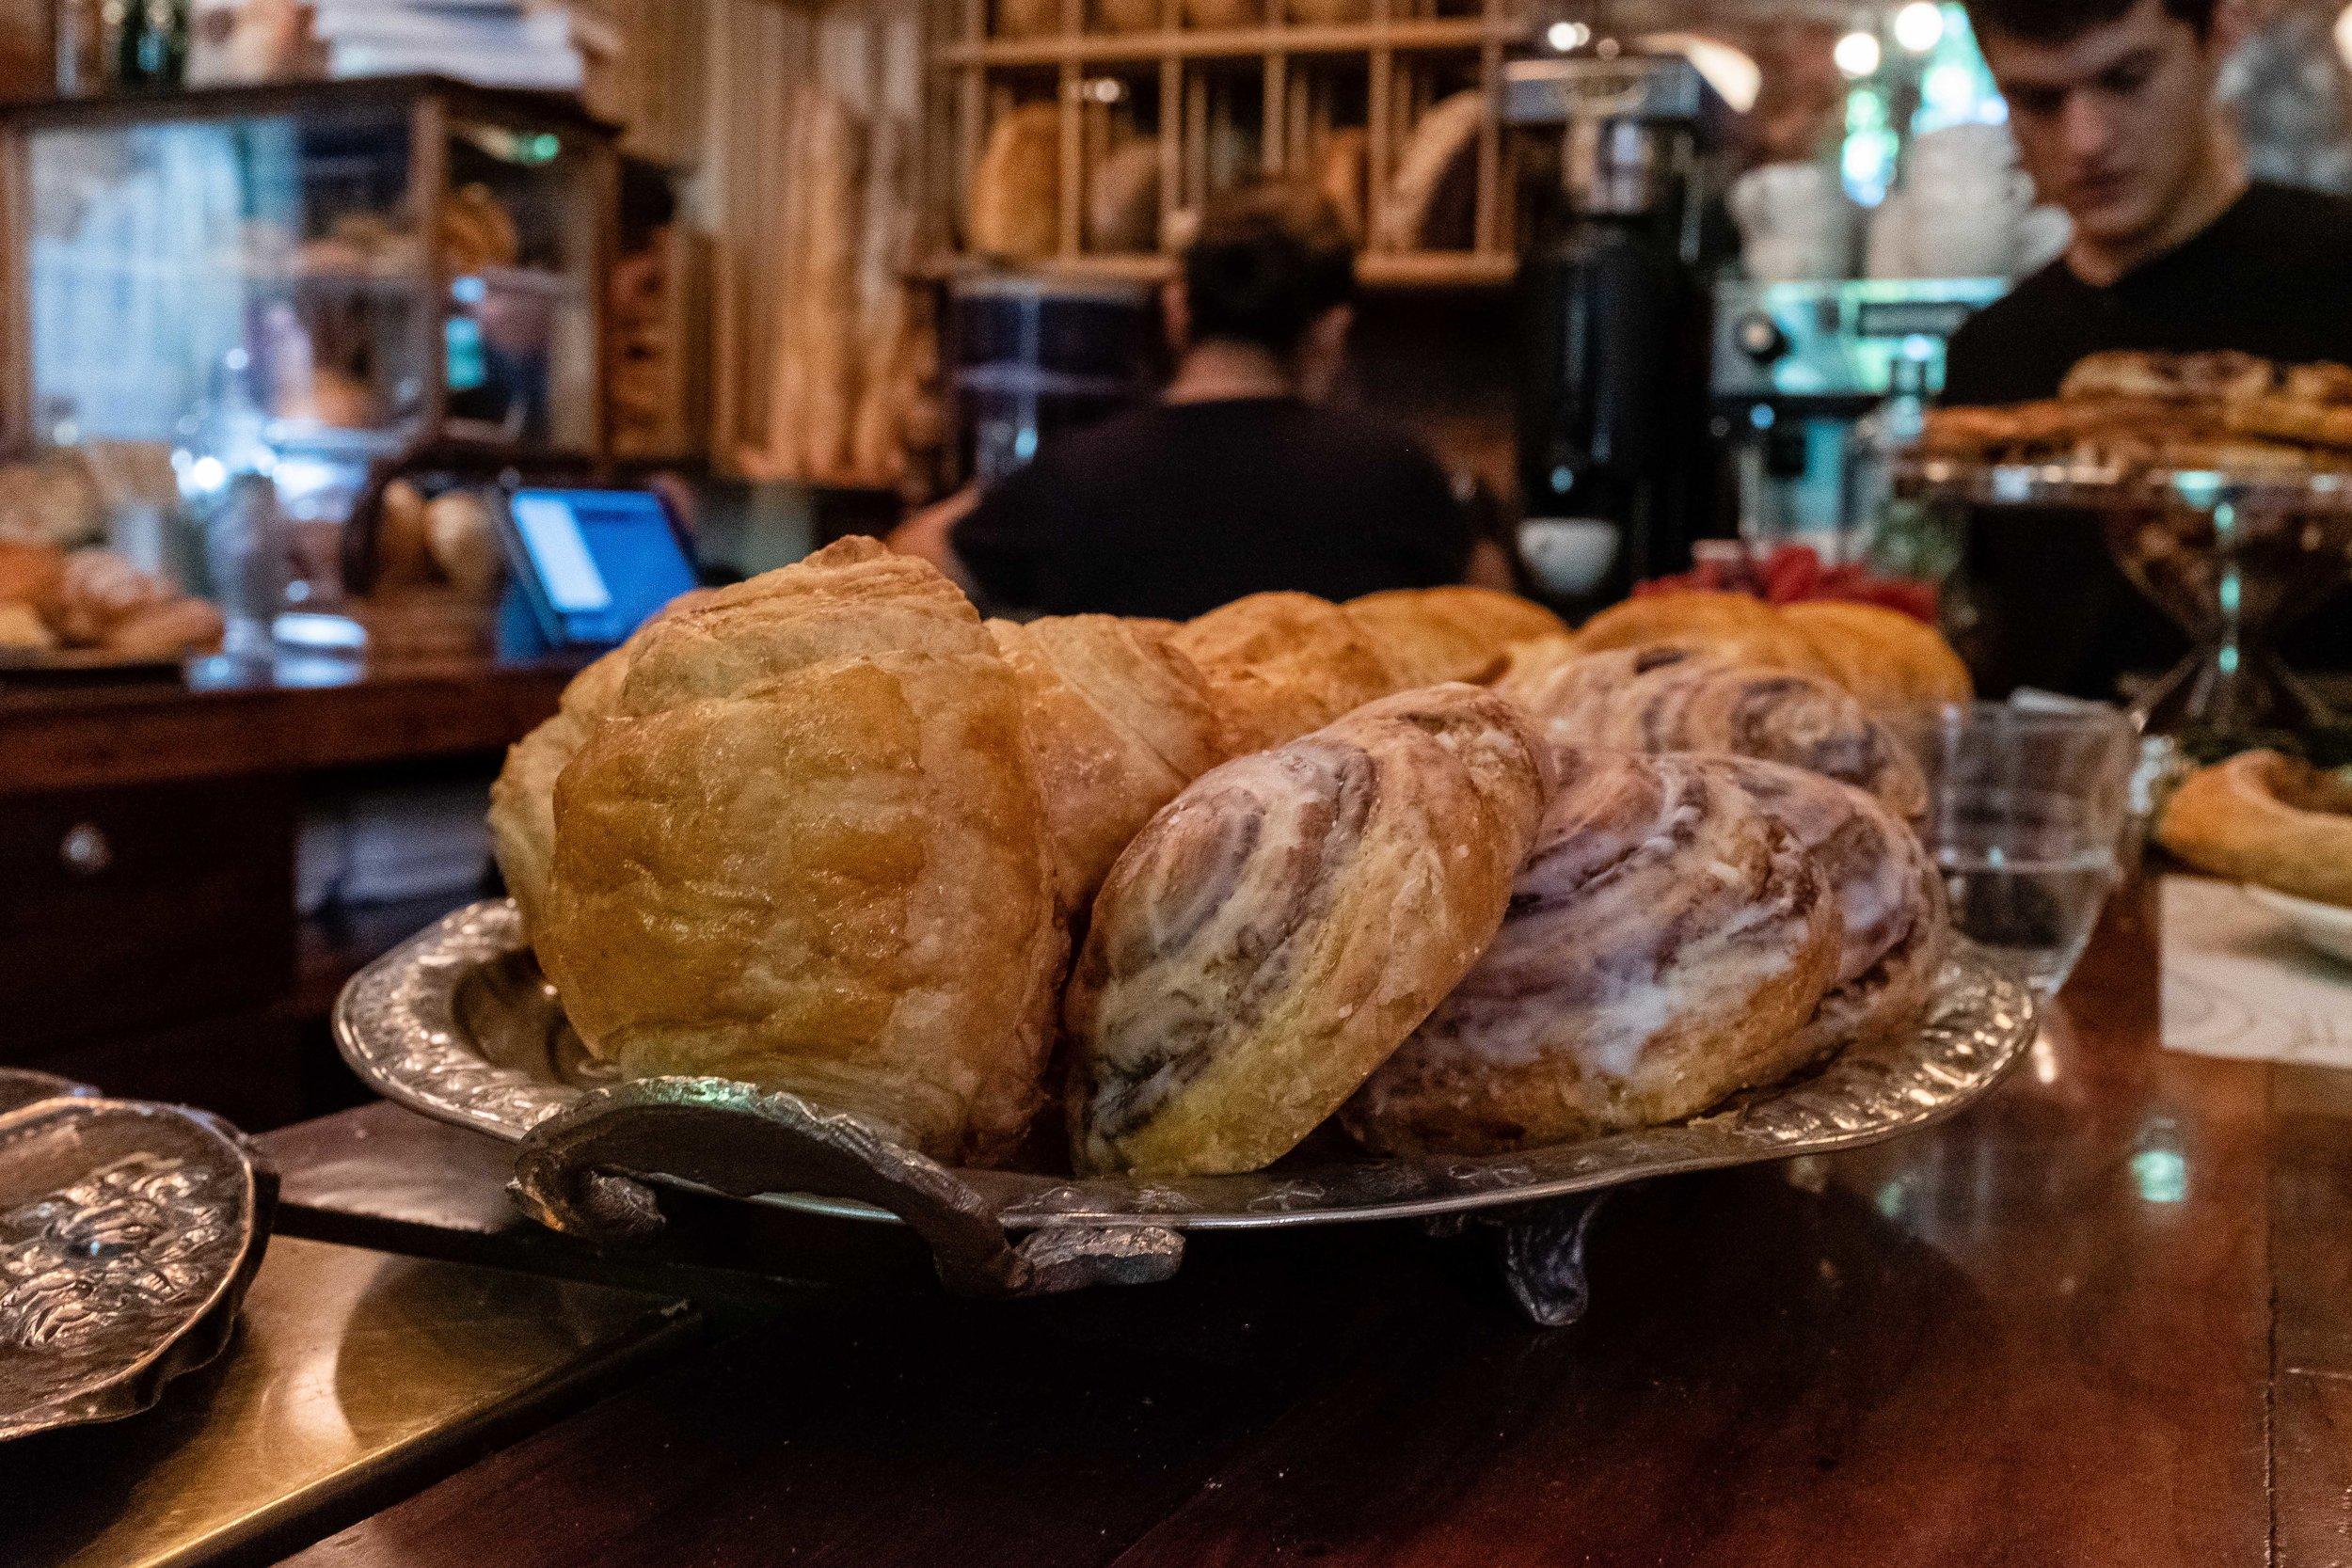 Morning pastries at Panaderia Rosetta Havre 73 Mexico City by Elena Reygadas.